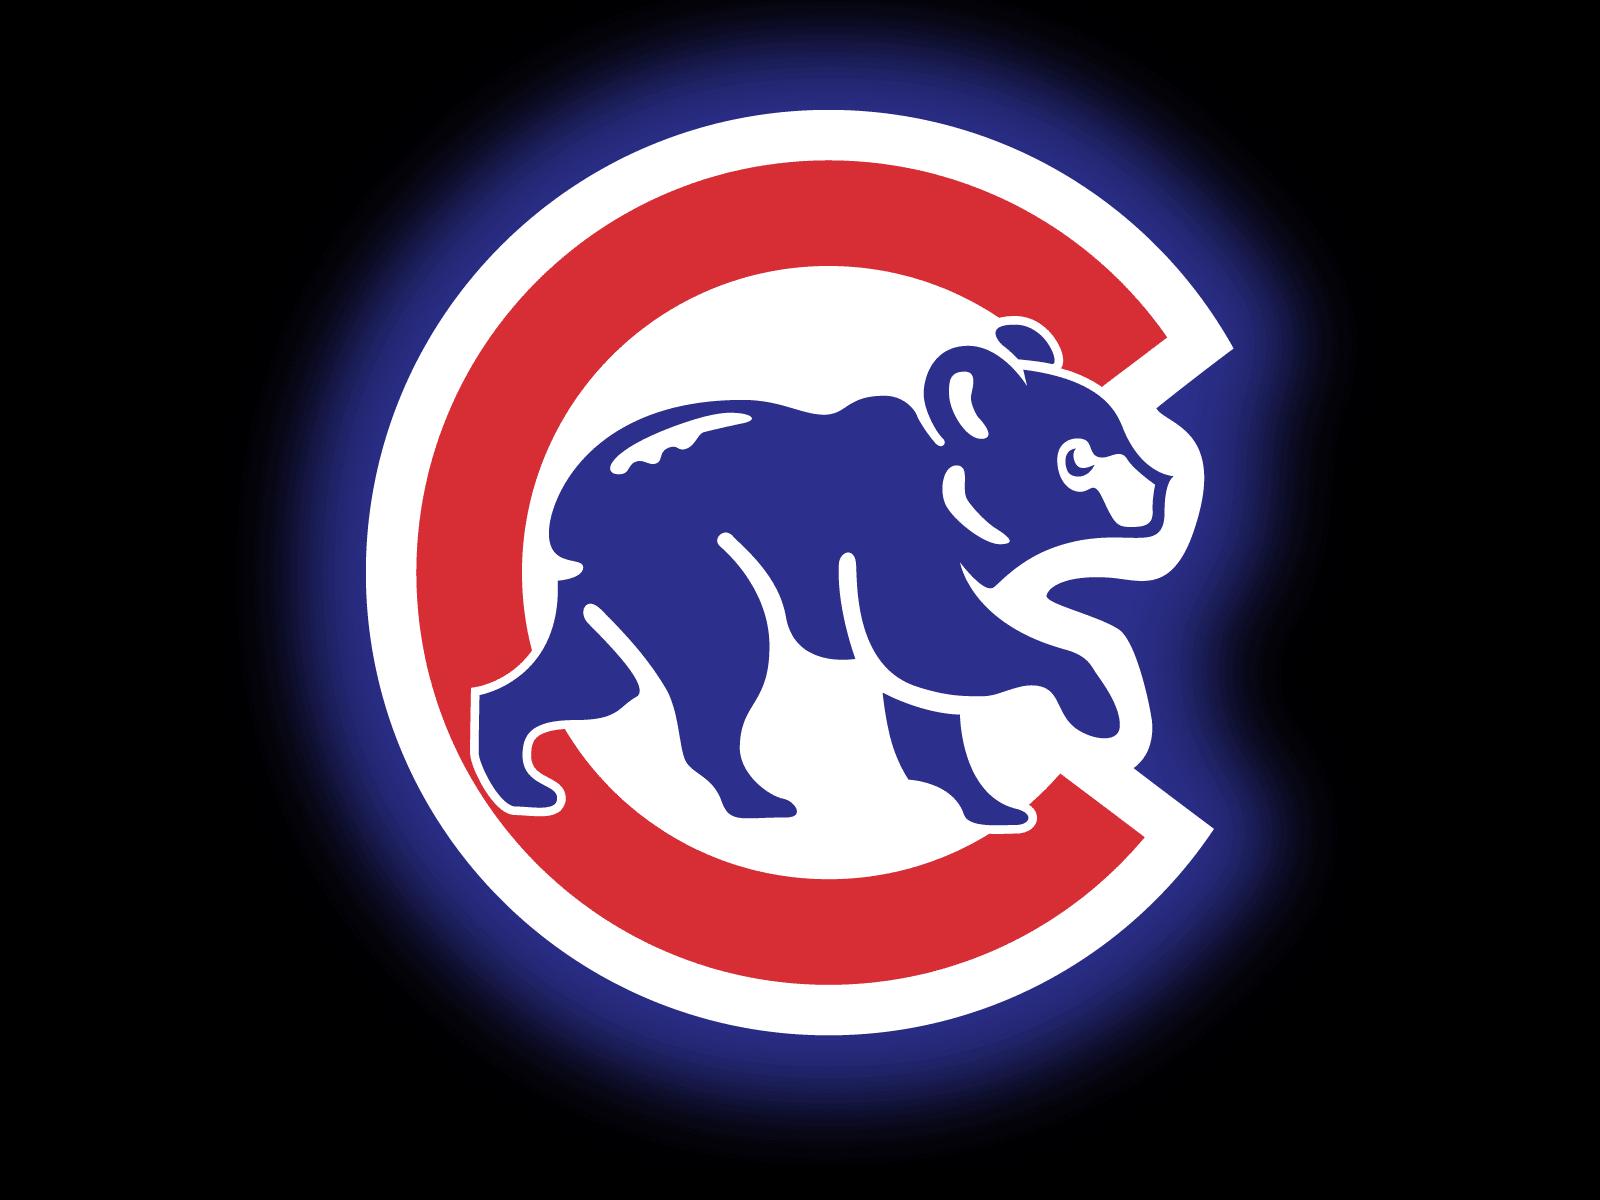 CHICAGO CUBS mlb baseball 1 wallpaper 1600x1200 232505 1600x1200